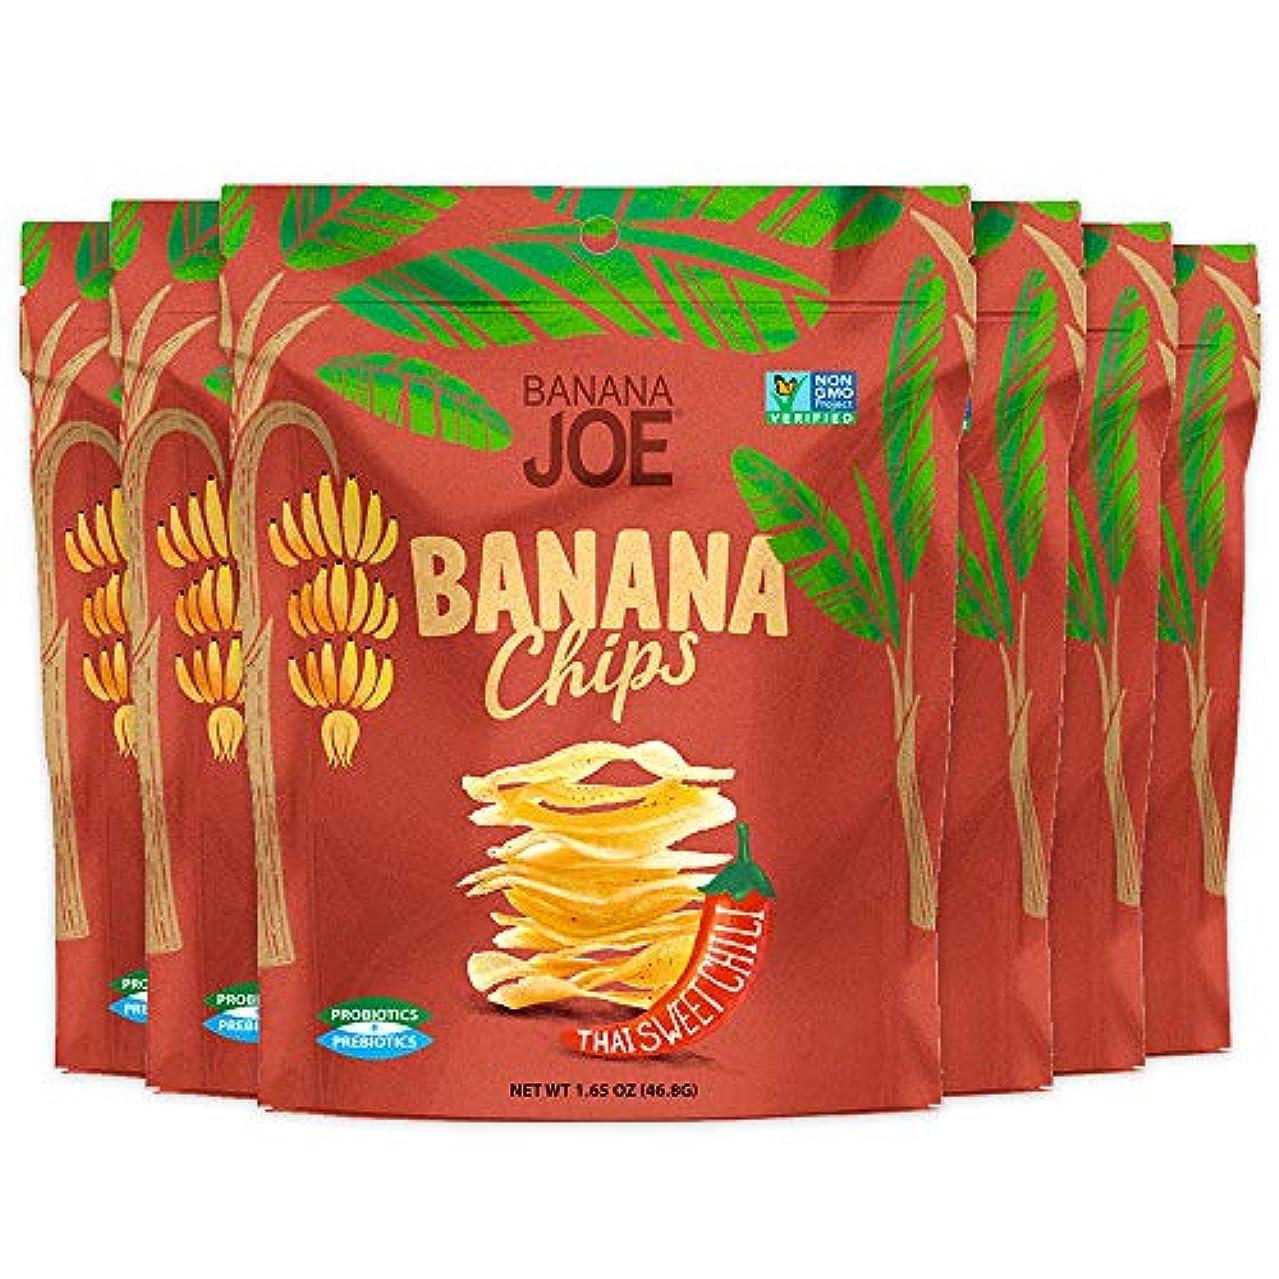 Healthy Snack | Banana Chips | Thai Sweet Chili | Gluten Free | High Vitamin Absorption | Prebiotic | Probiotic | Banana Joe